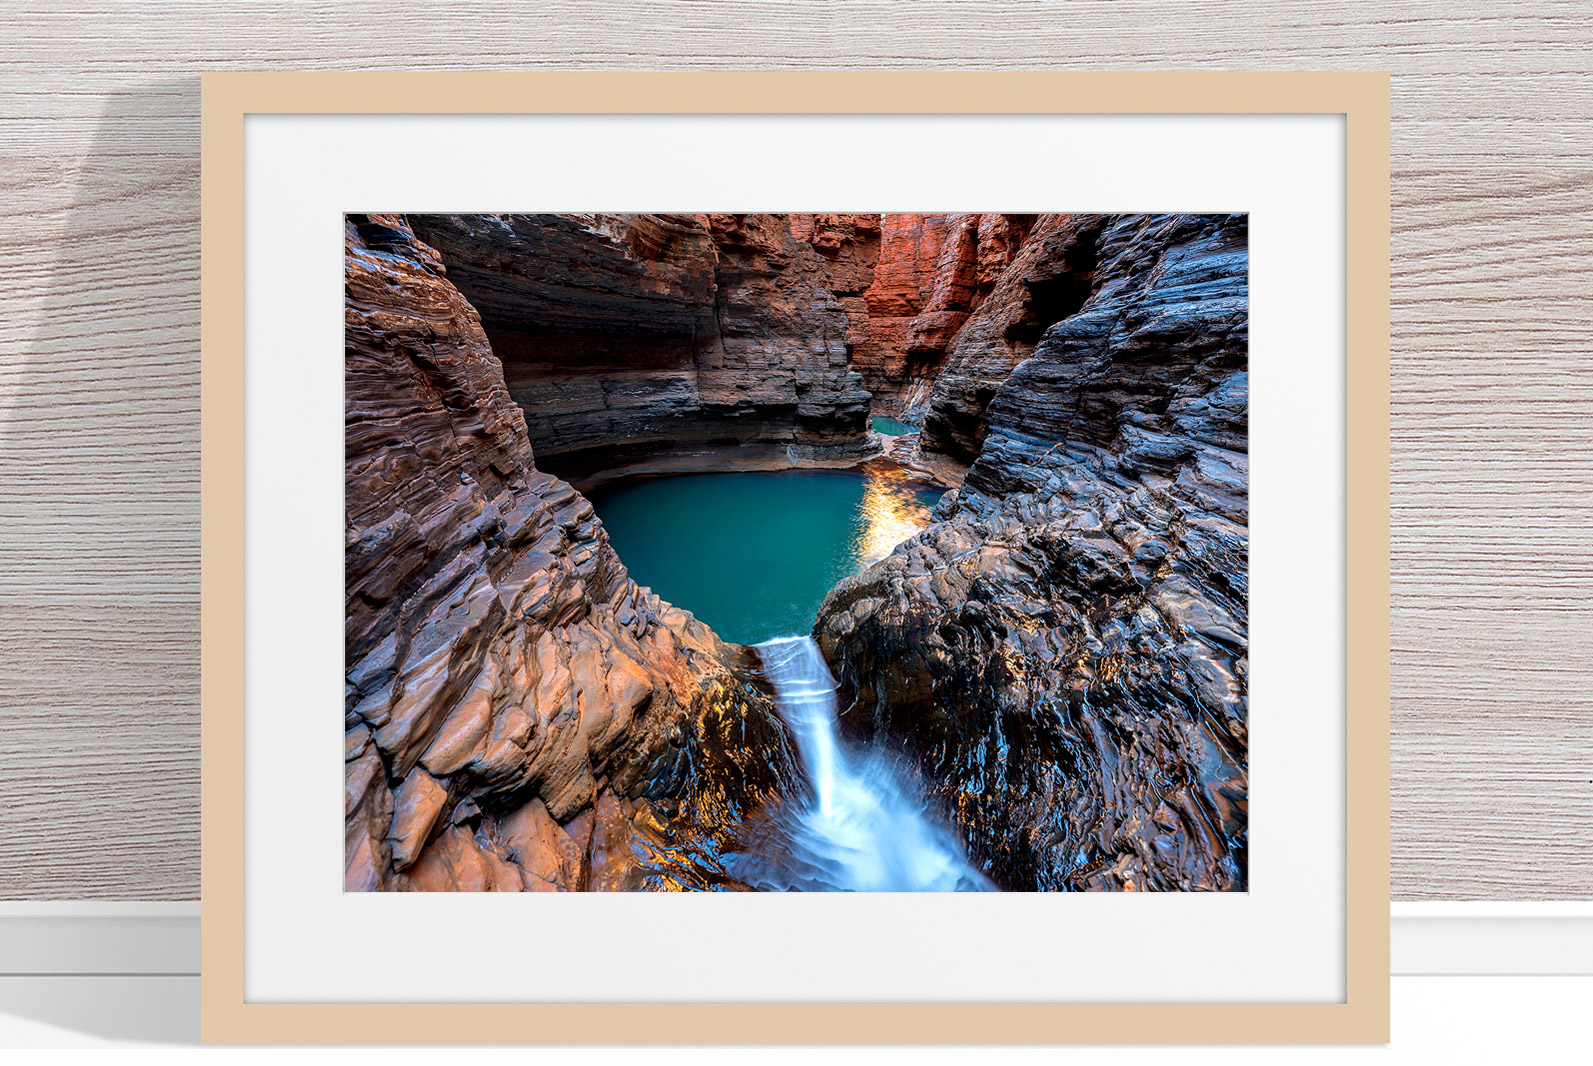 Jason Mazur - 'Regan's Pool, Hancock Gorge 036' Light Wood Frame